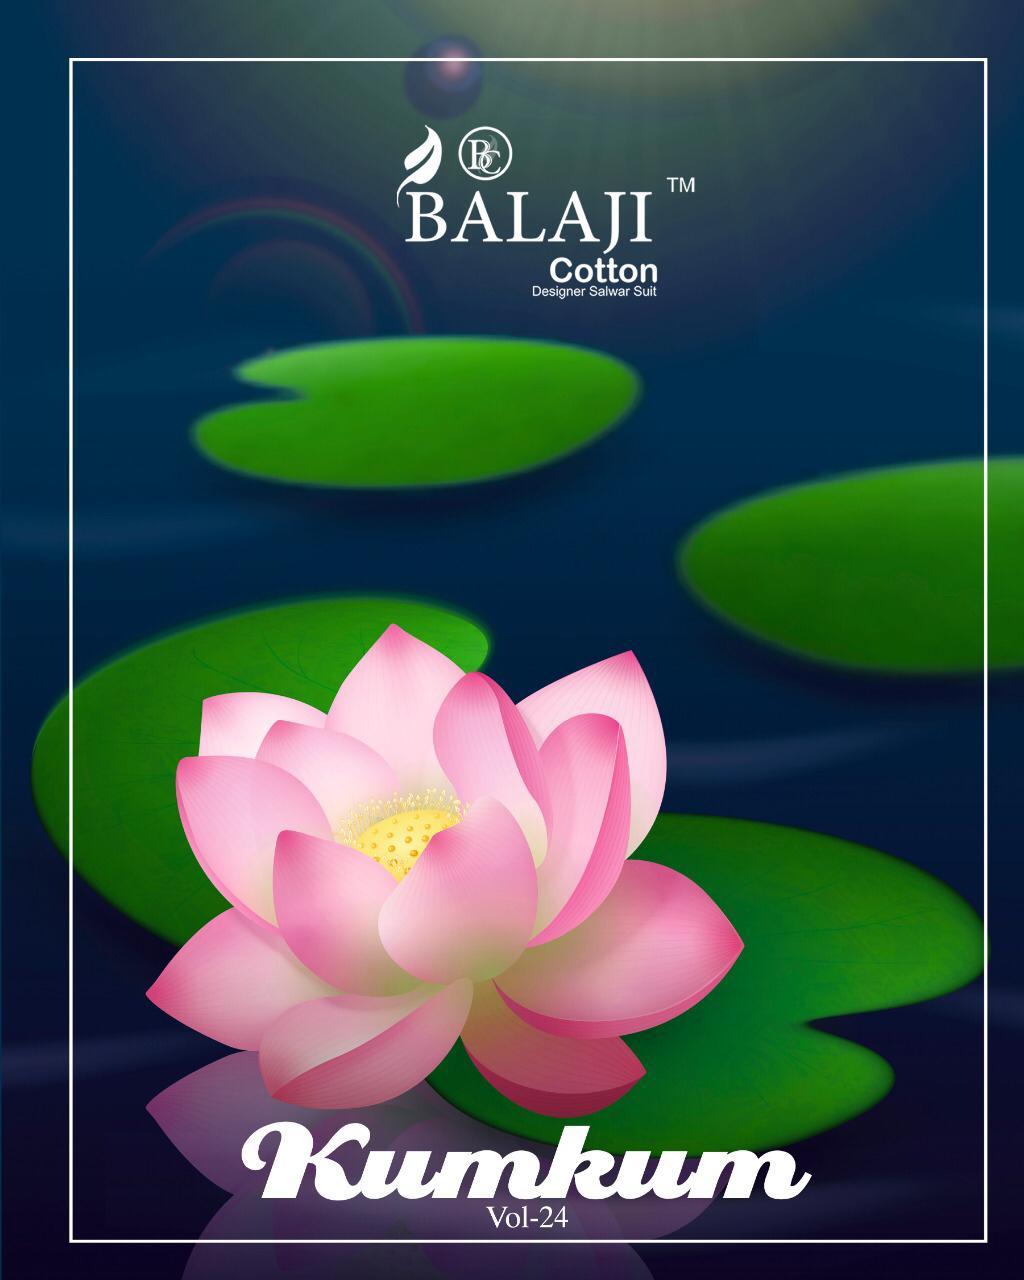 Balaji Kumkum Vol 24 Pure Cotton Suit